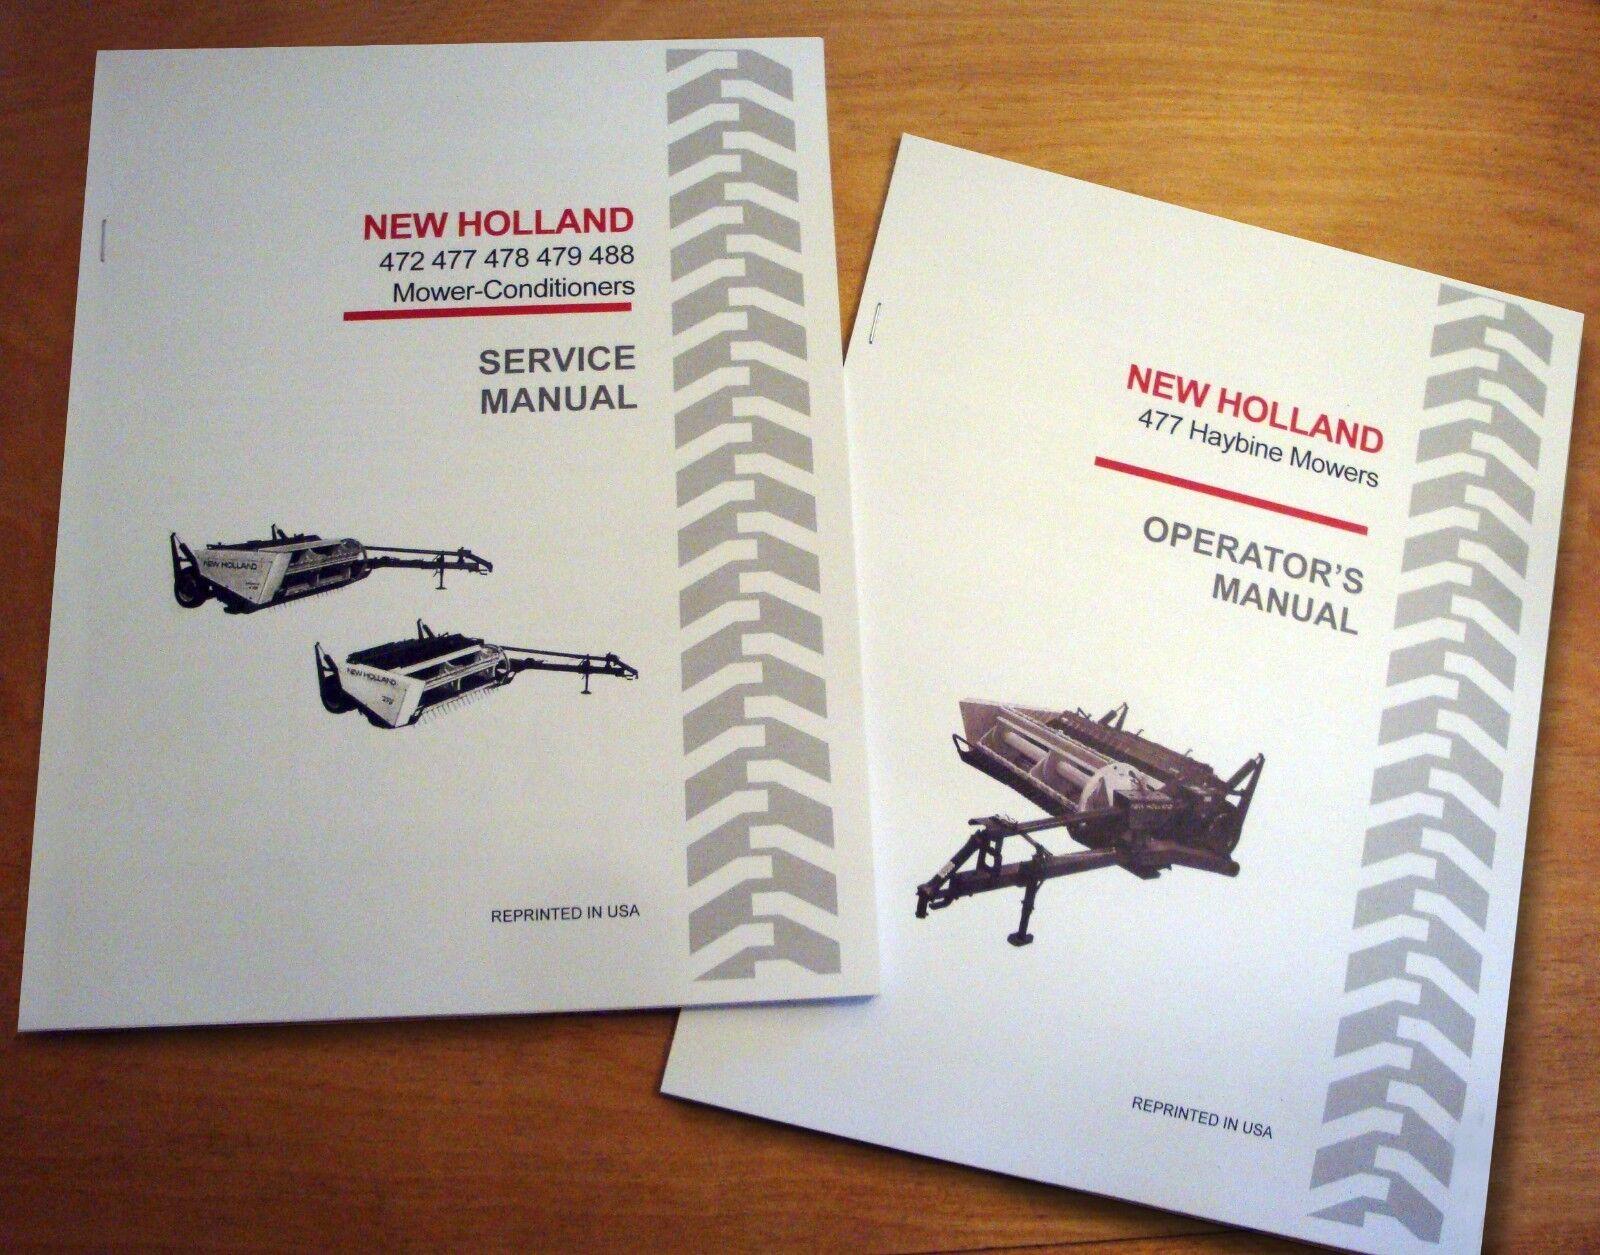 New holland 477 Service manual